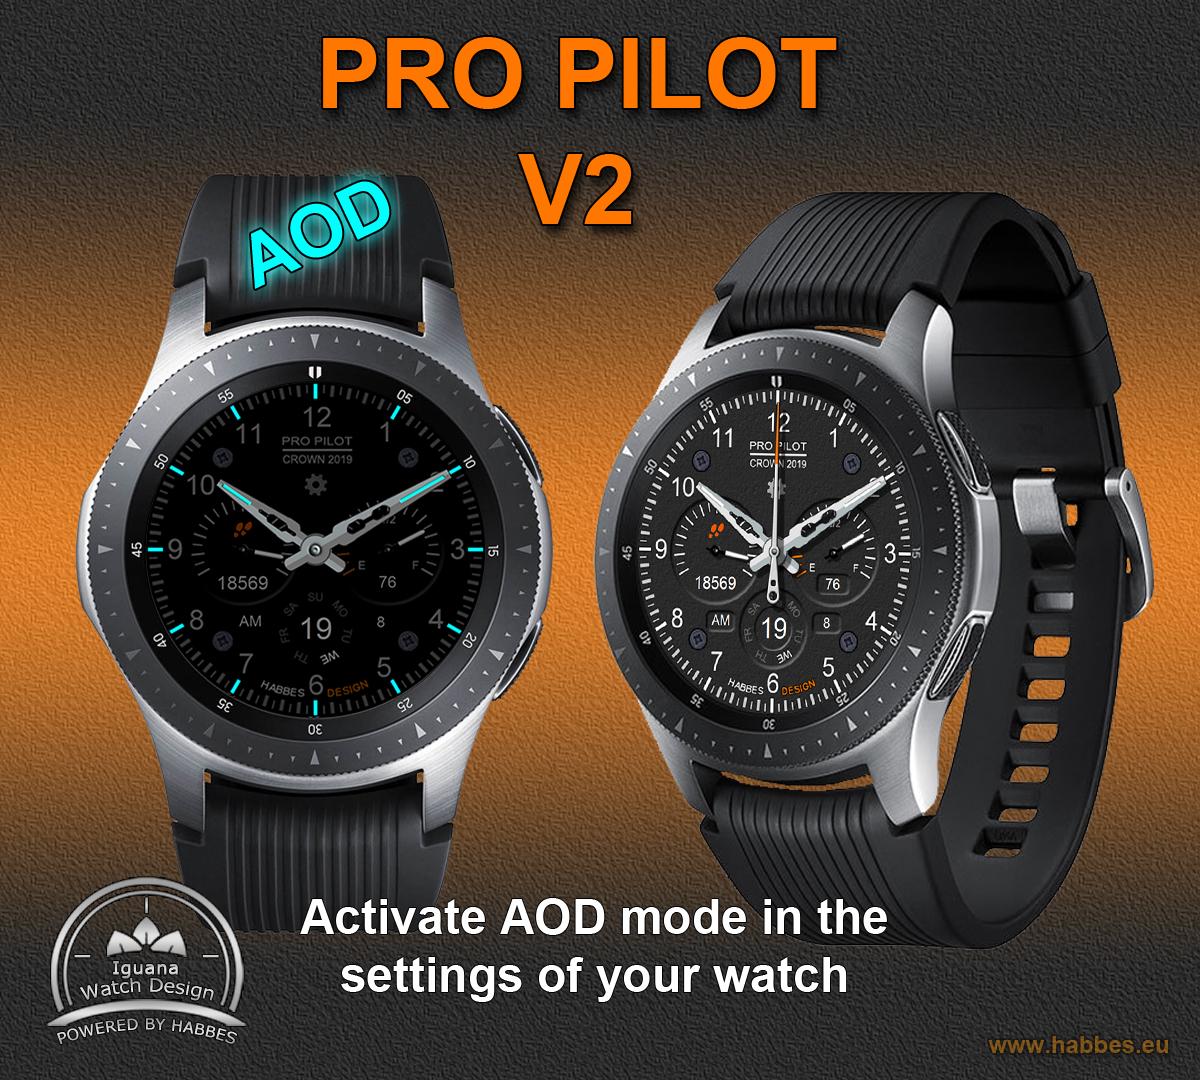 IWD ProPilot V2